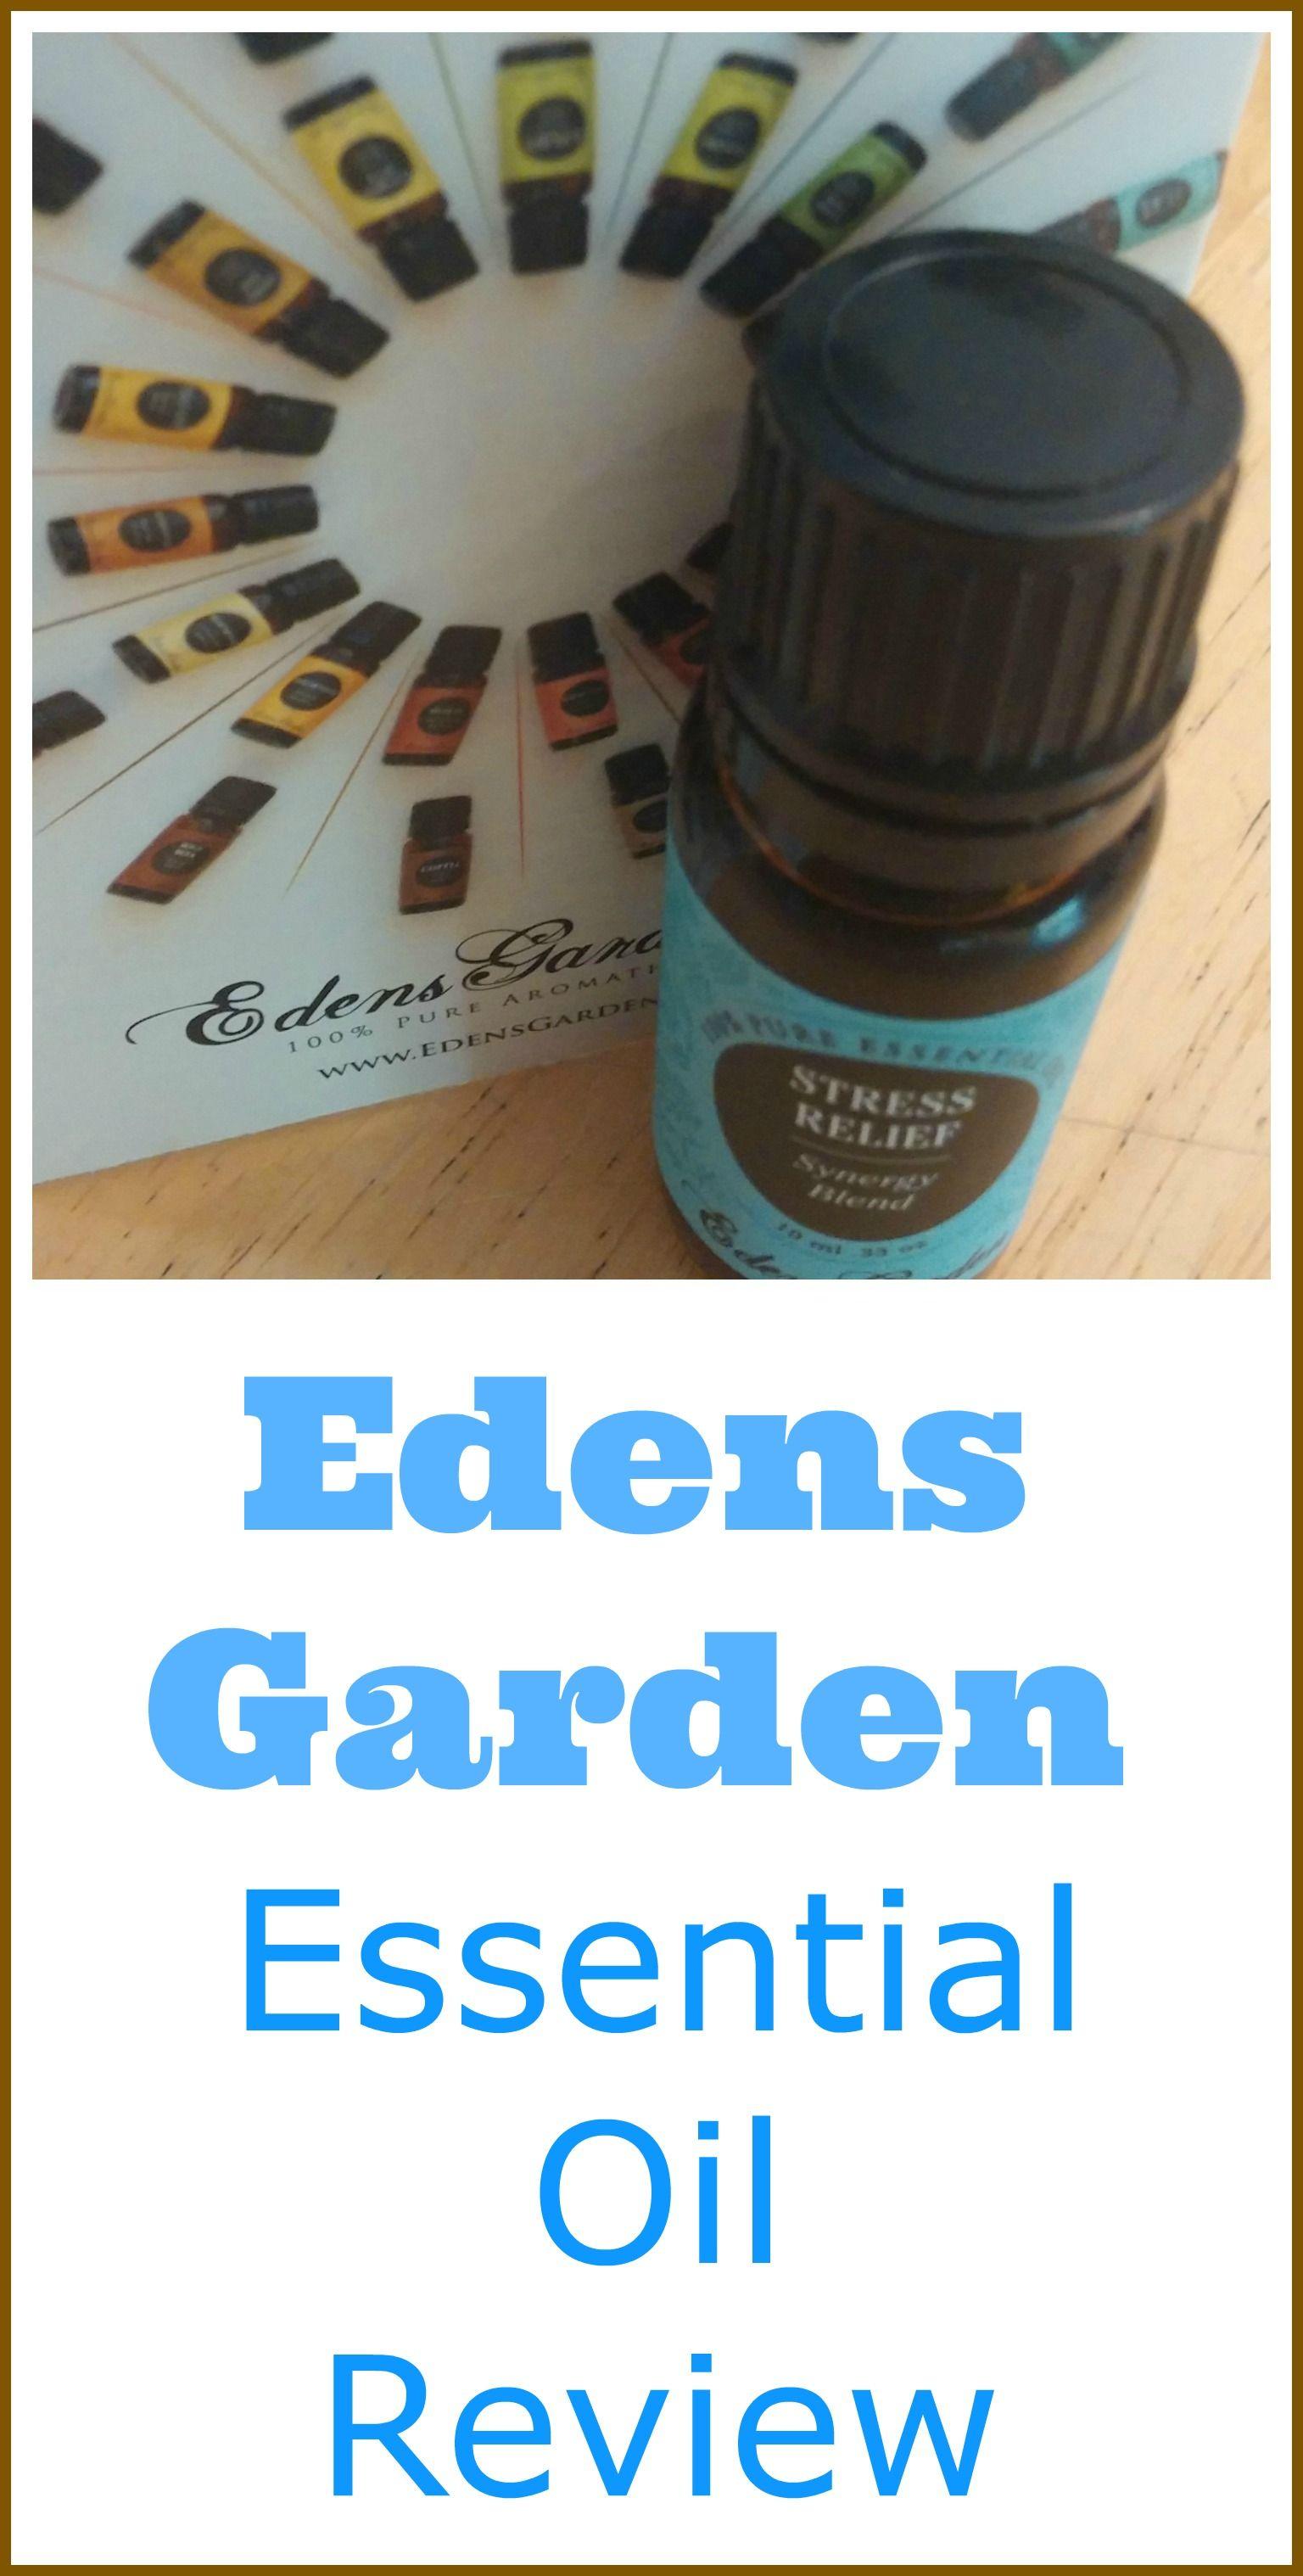 Edens Garden Essential Oils Reviews Edens garden